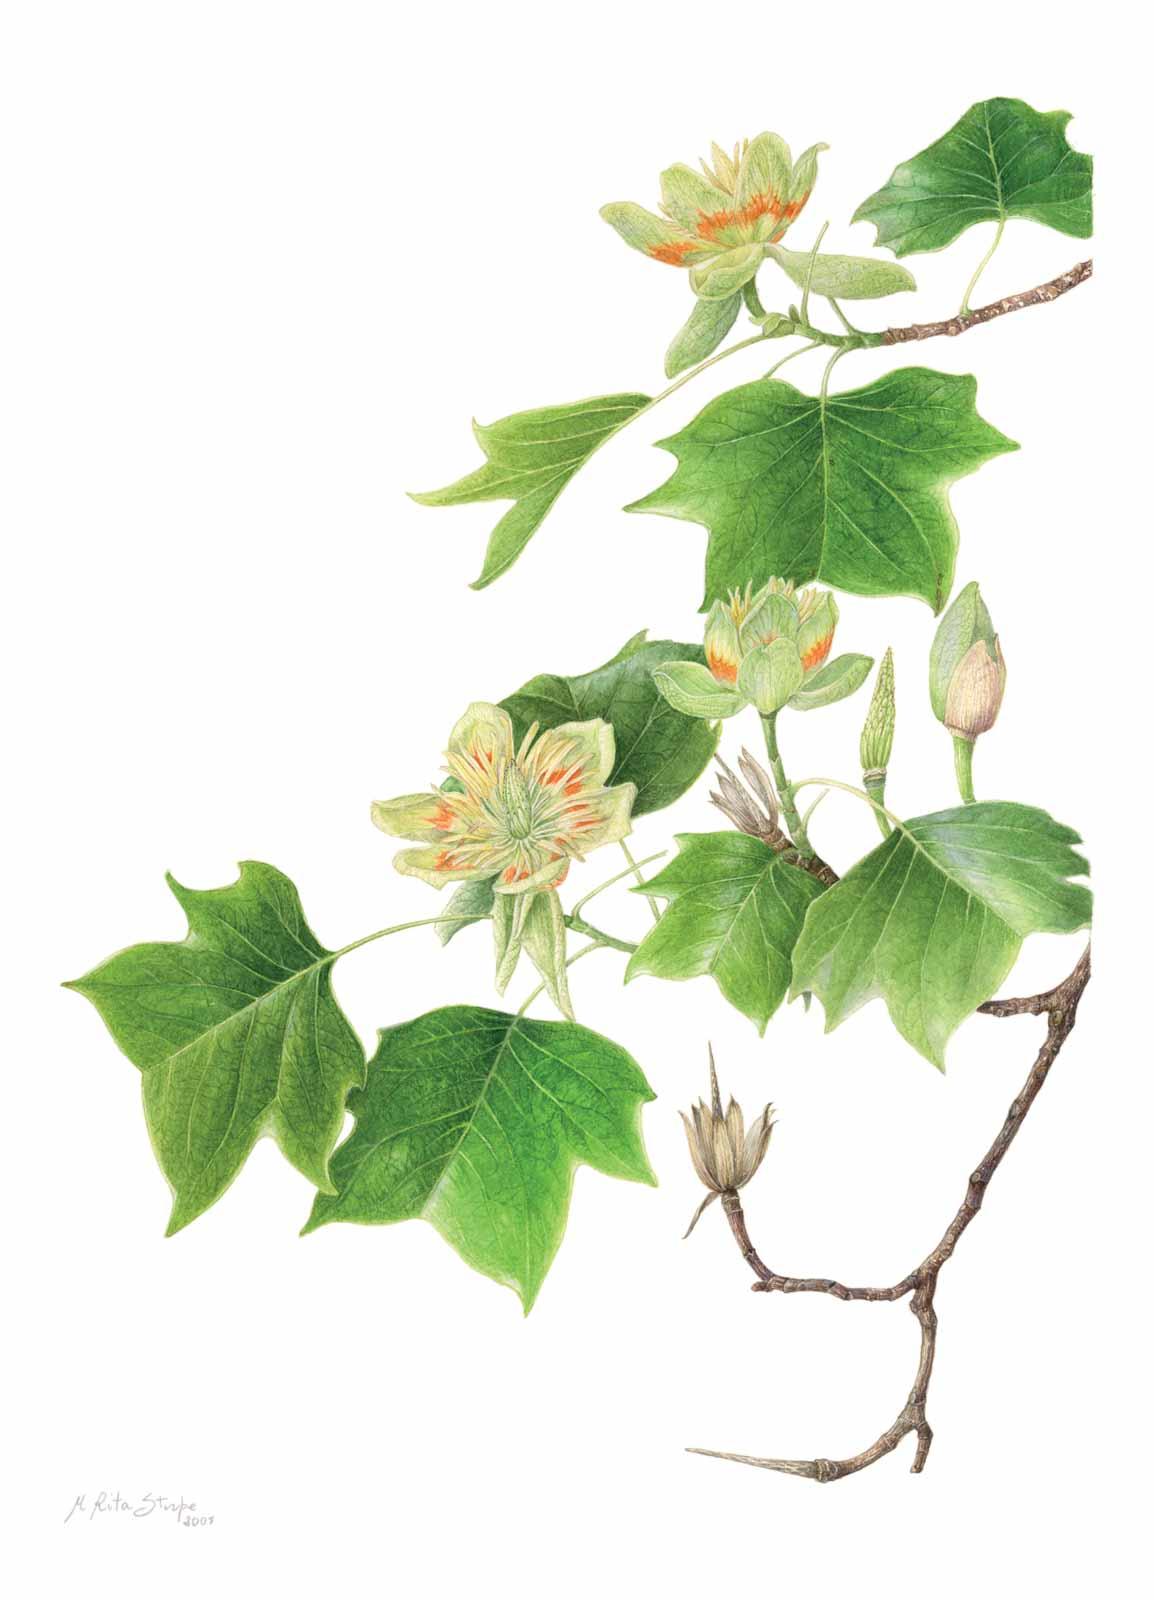 Catalogo - Ars Botanica - Stampa 04